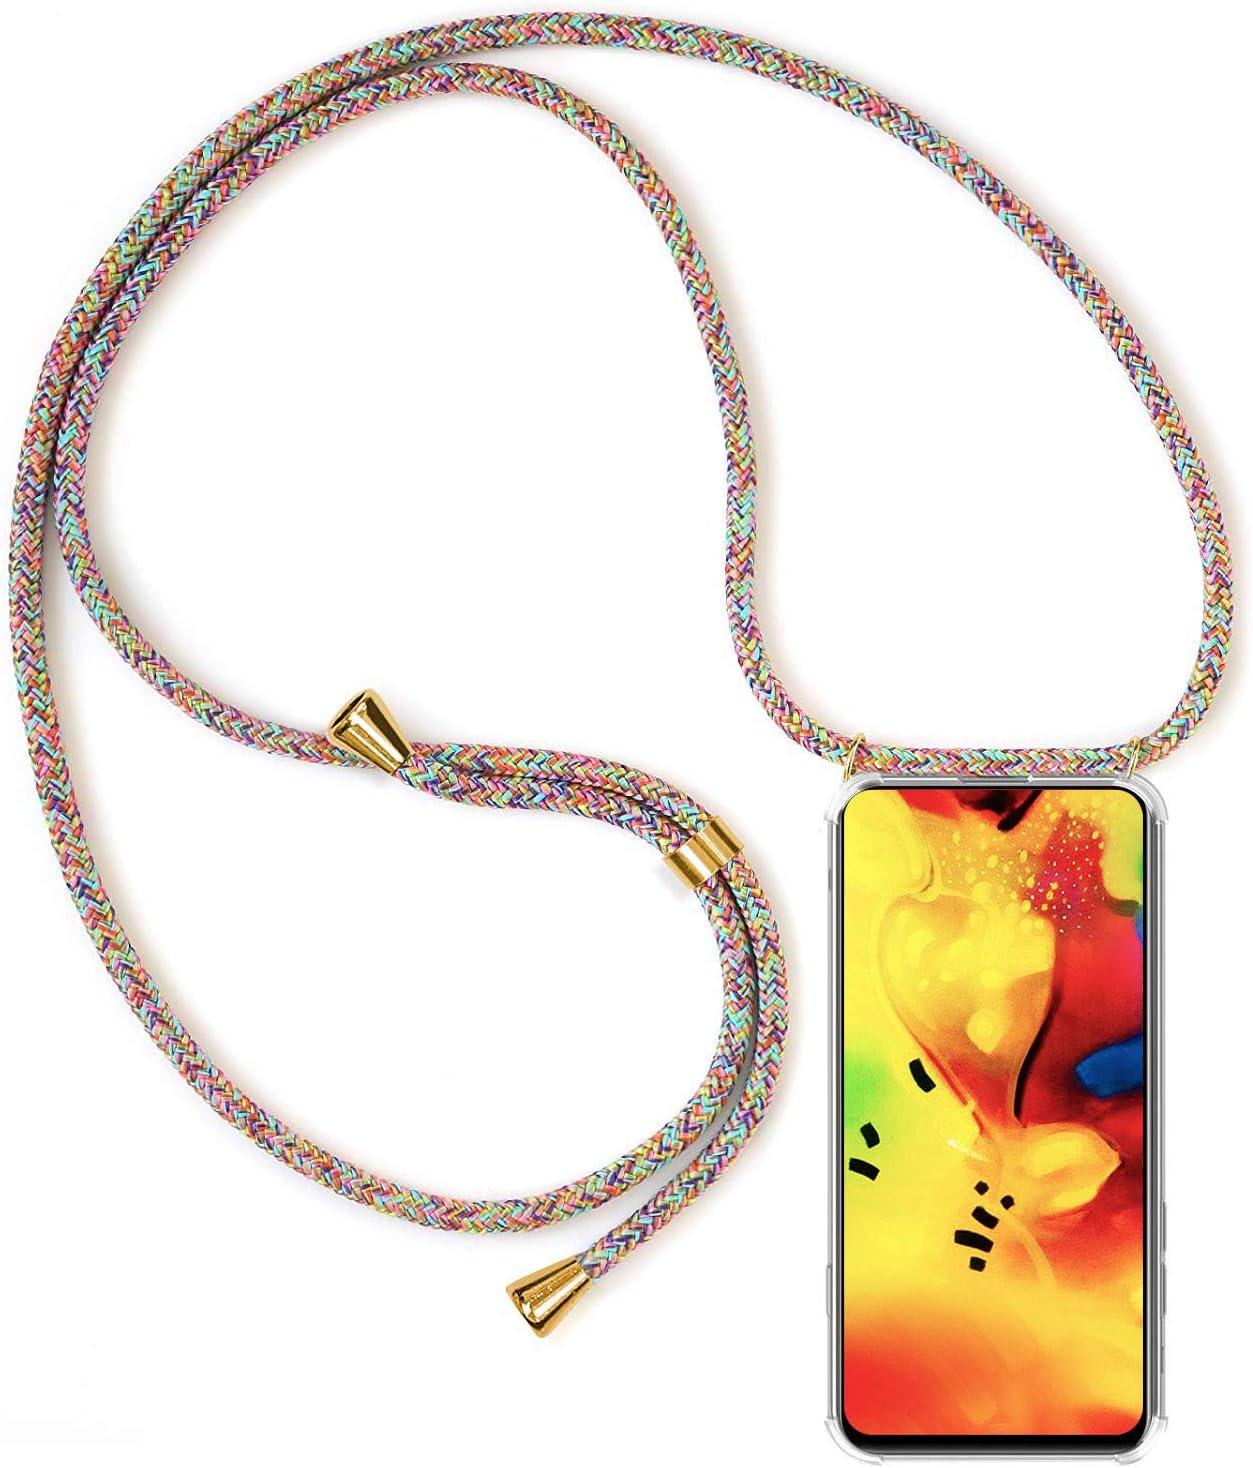 - Oro Rosa Ultrafina Suave TPU Funda de movil con Colgante Anti-rasgu/ños Anti-Choque Moda y Practico XTCASE Carcasa con Cuerda para LG G8s ThinQ Silicona Transparente